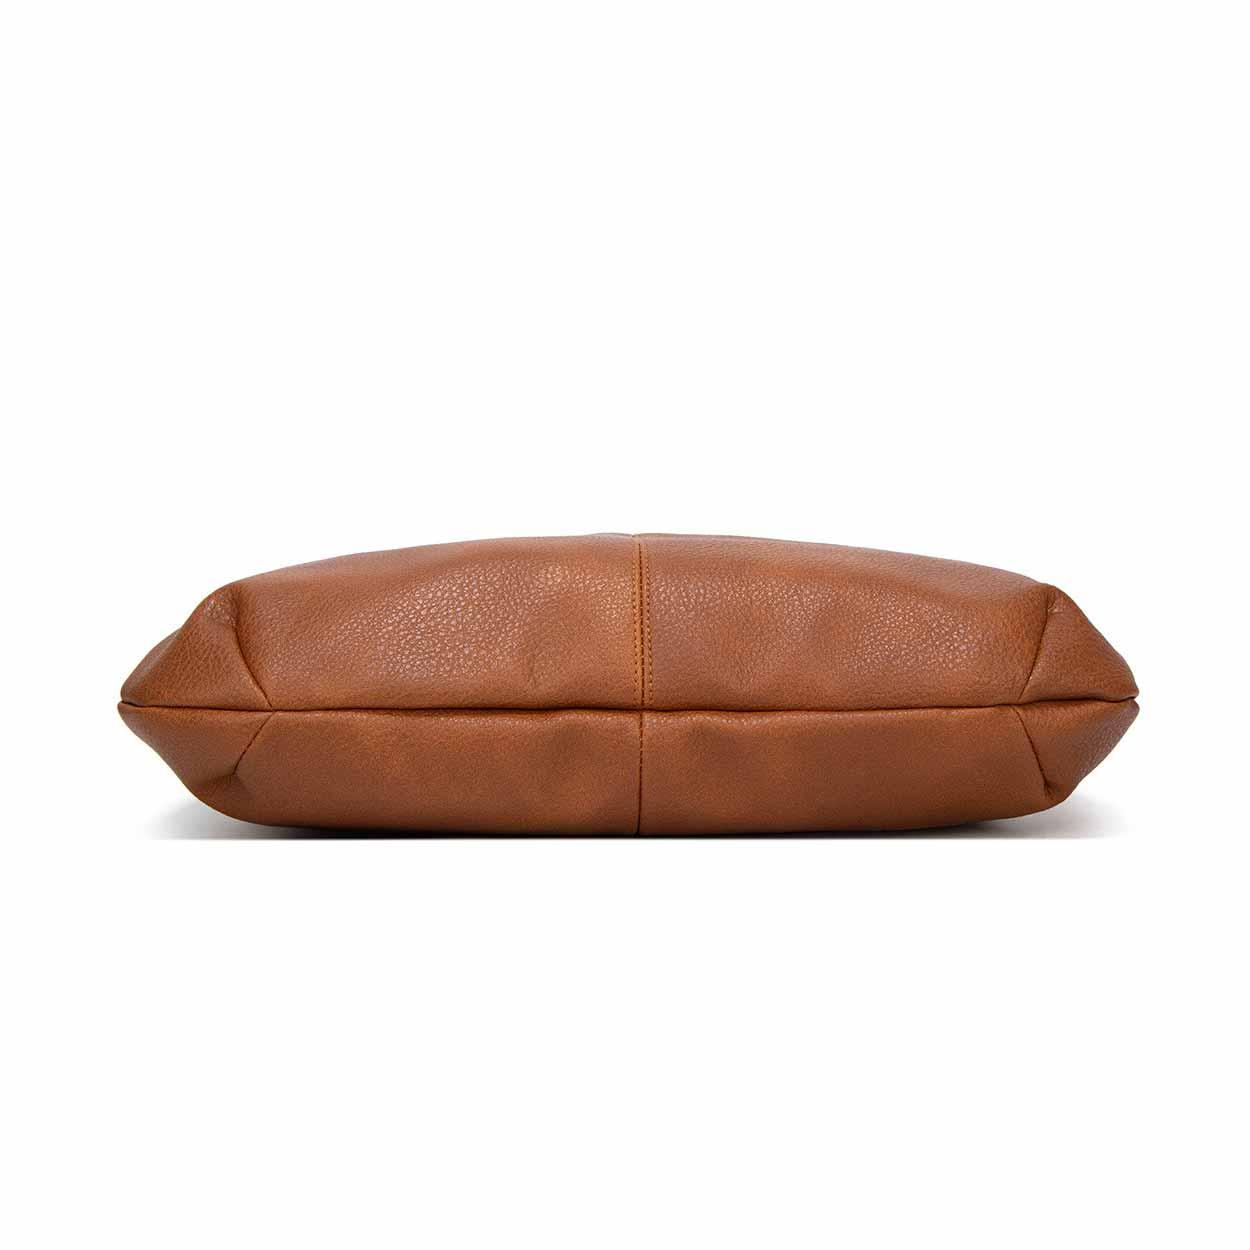 handväska brunt skinn